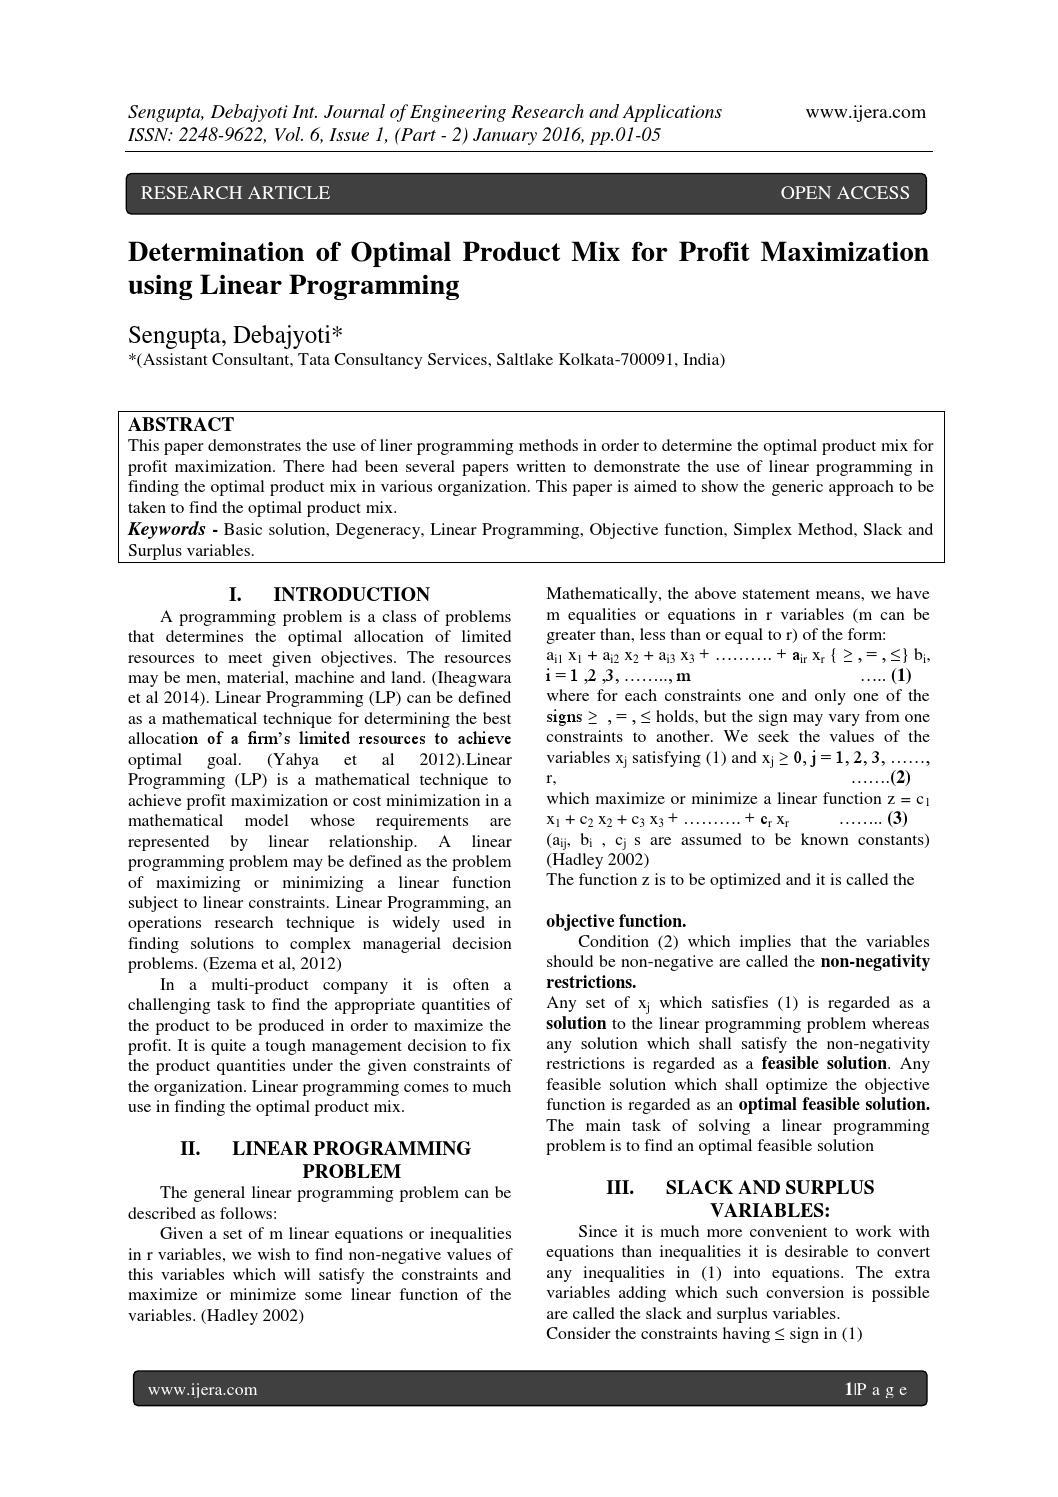 Determination of Optimal Product Mix for Profit Maximization